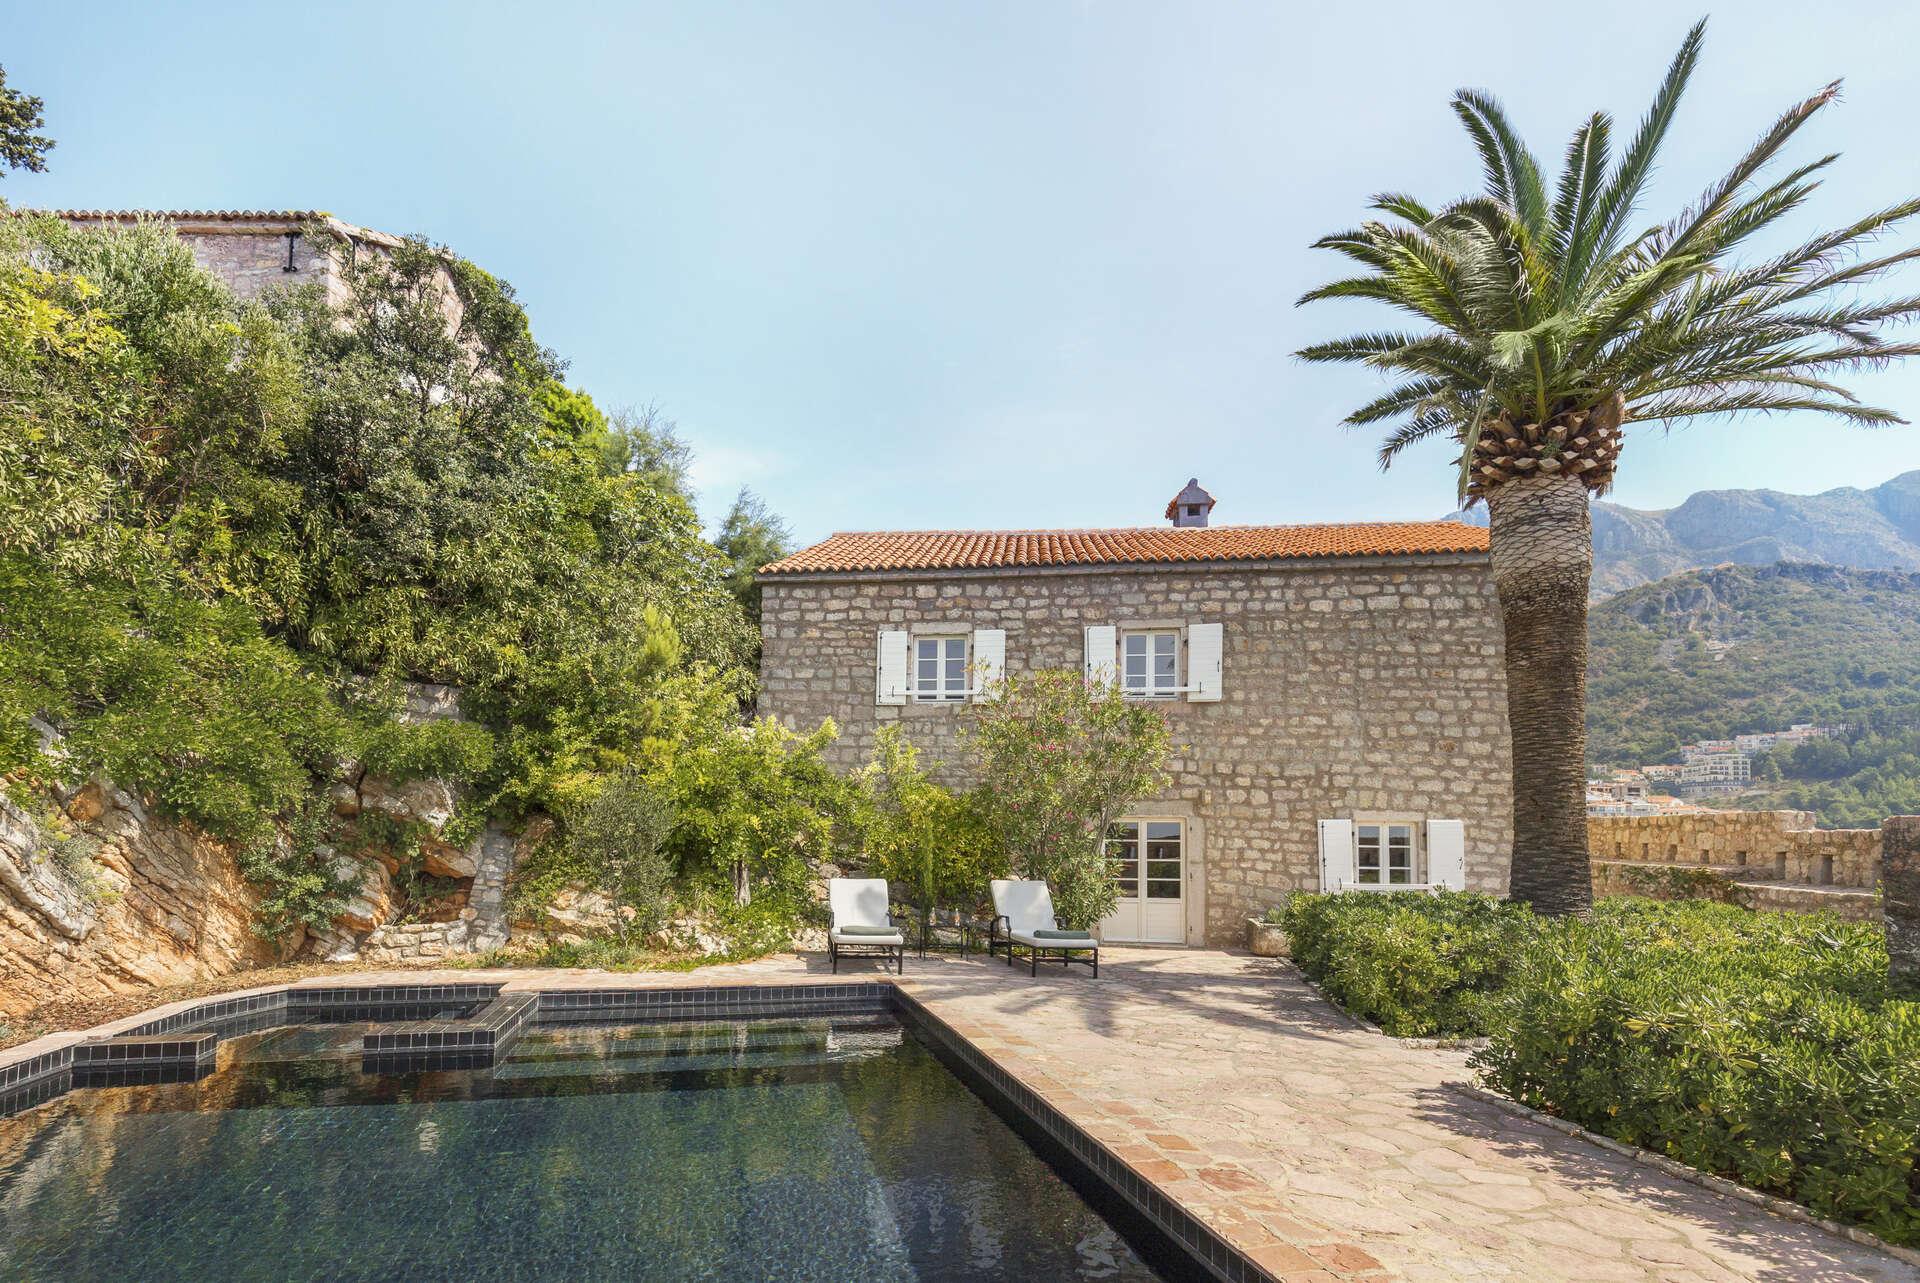 Luxury vacation rentals europe - Montenegro - Aman sveti stefan - No location 4 - Sveti Stefan Suite - Image 1/28